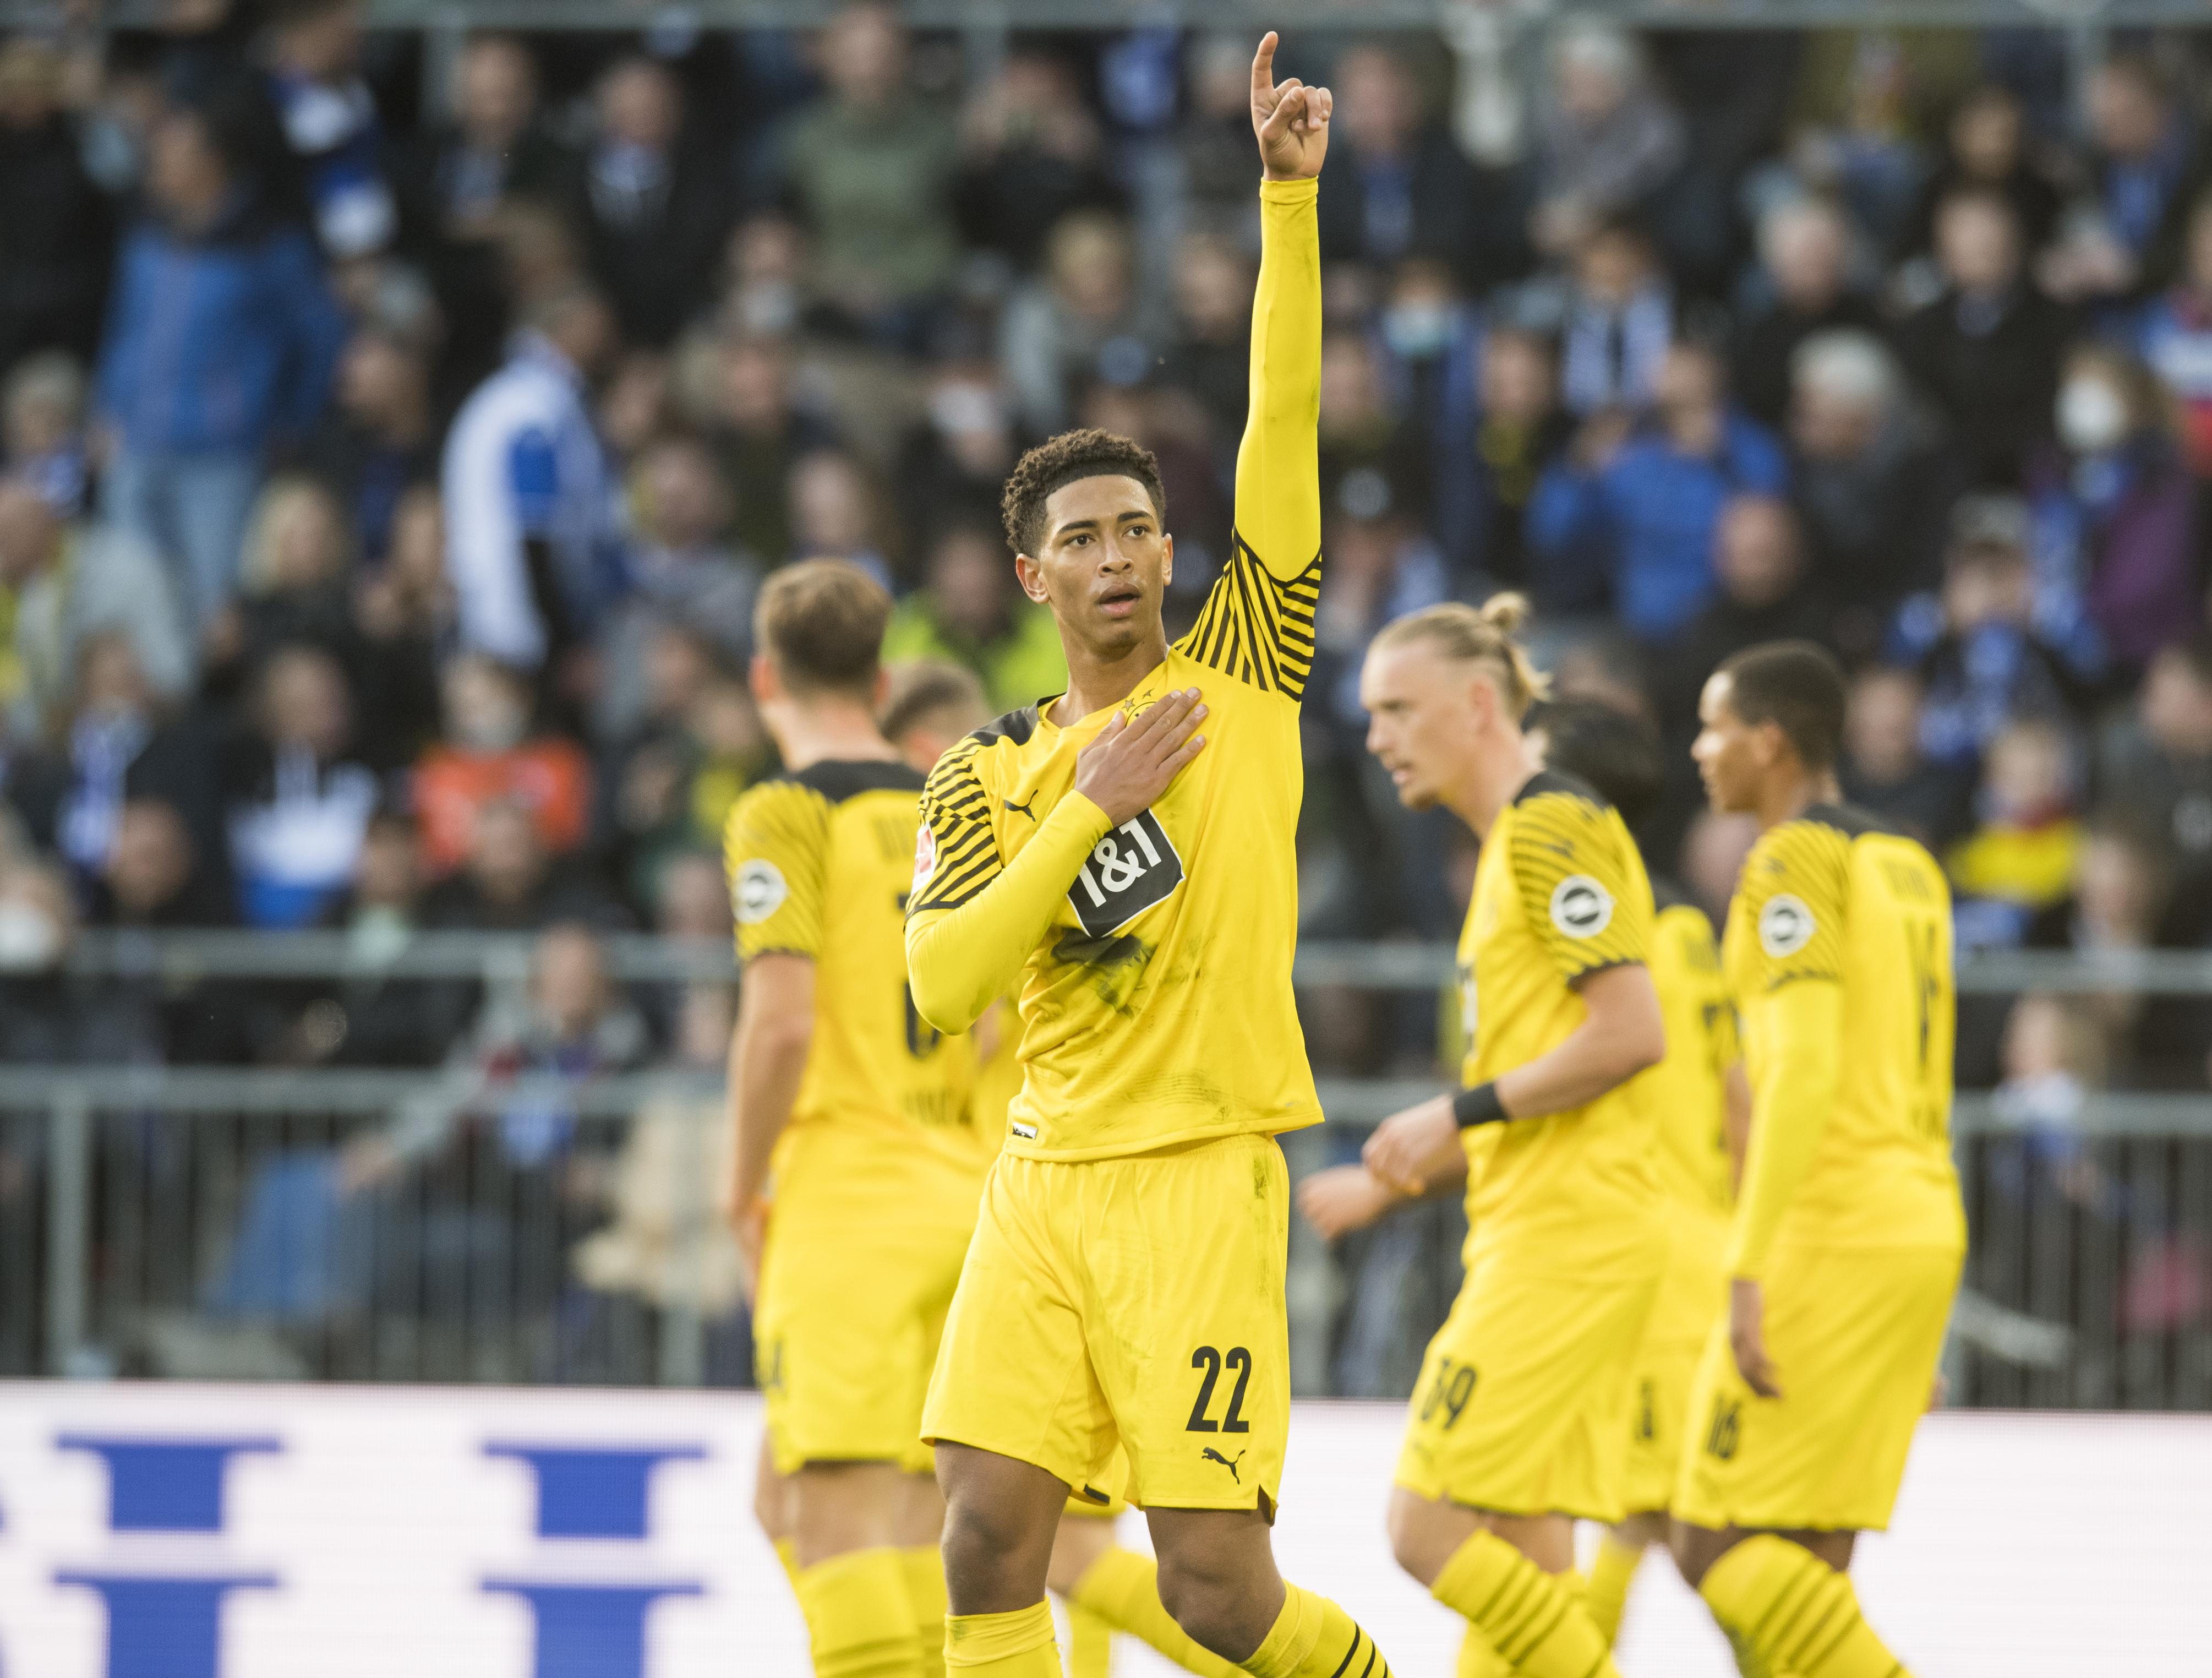 DSC Arminia Bielefeld v Borussia Dortmund - Bundesliga